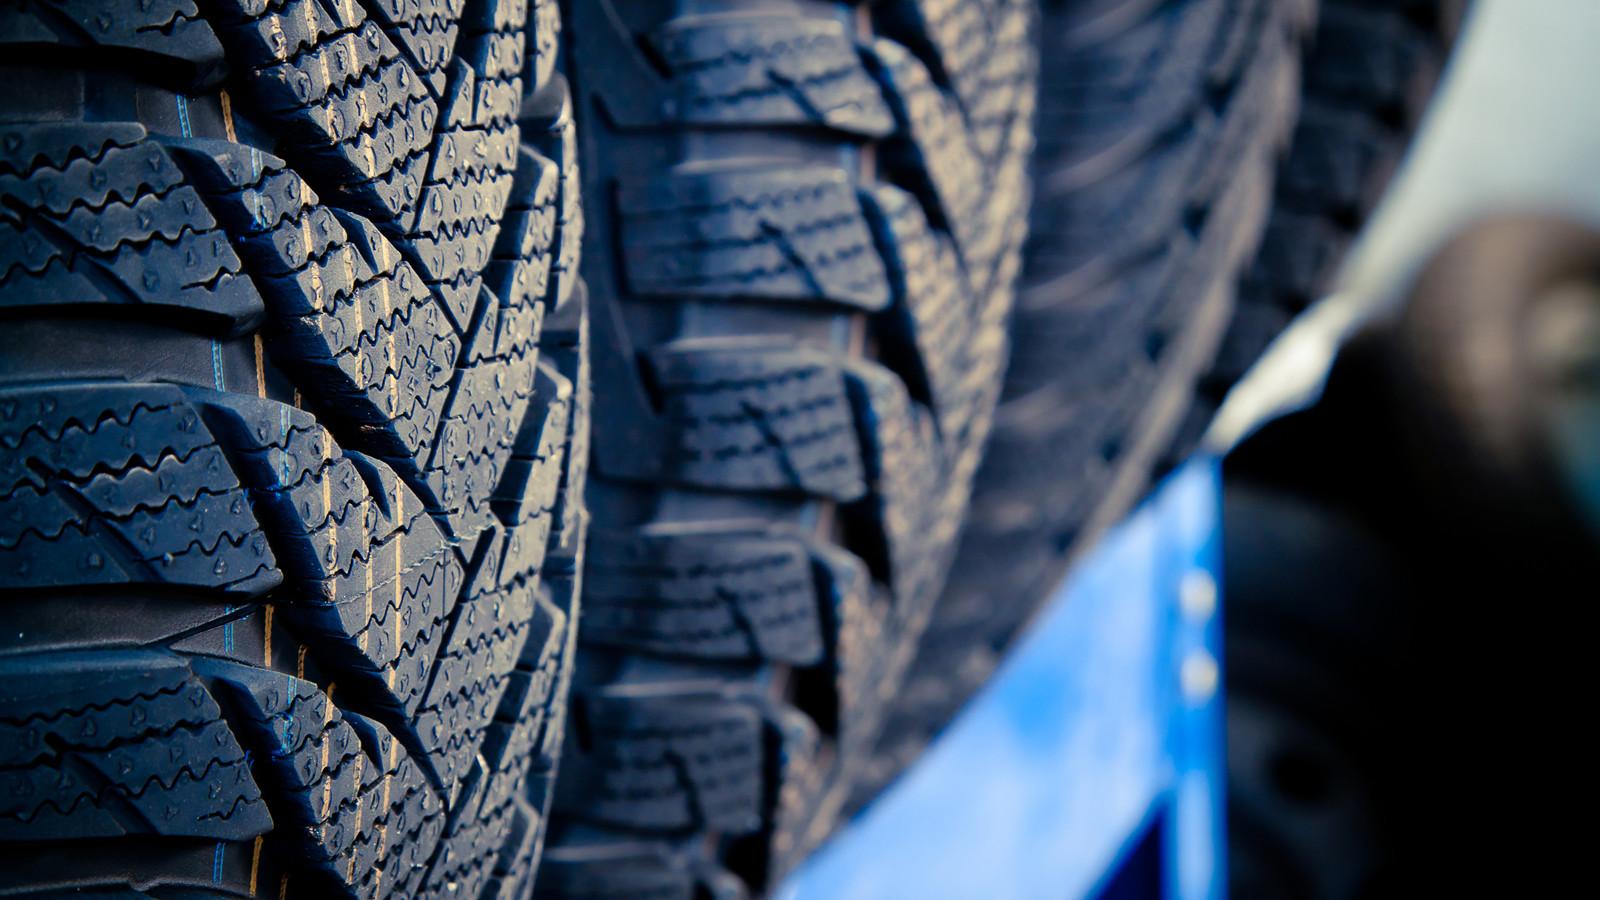 Tyre close